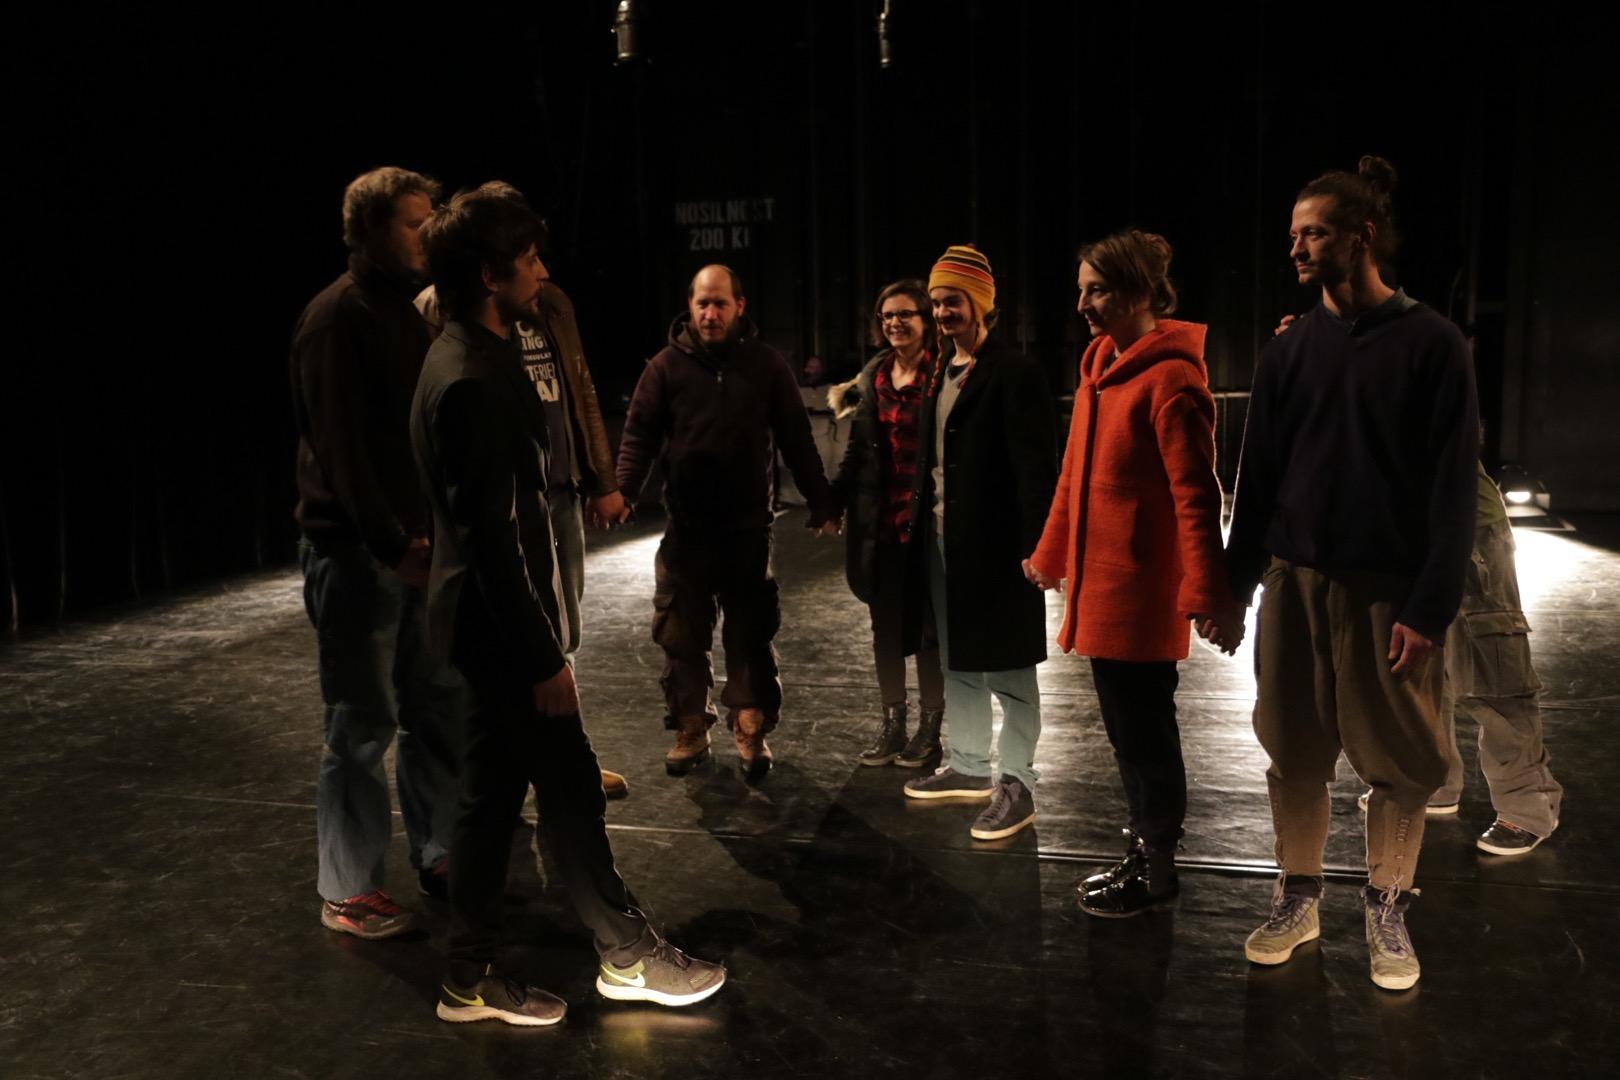 selfy-participatory-dance-performance-06